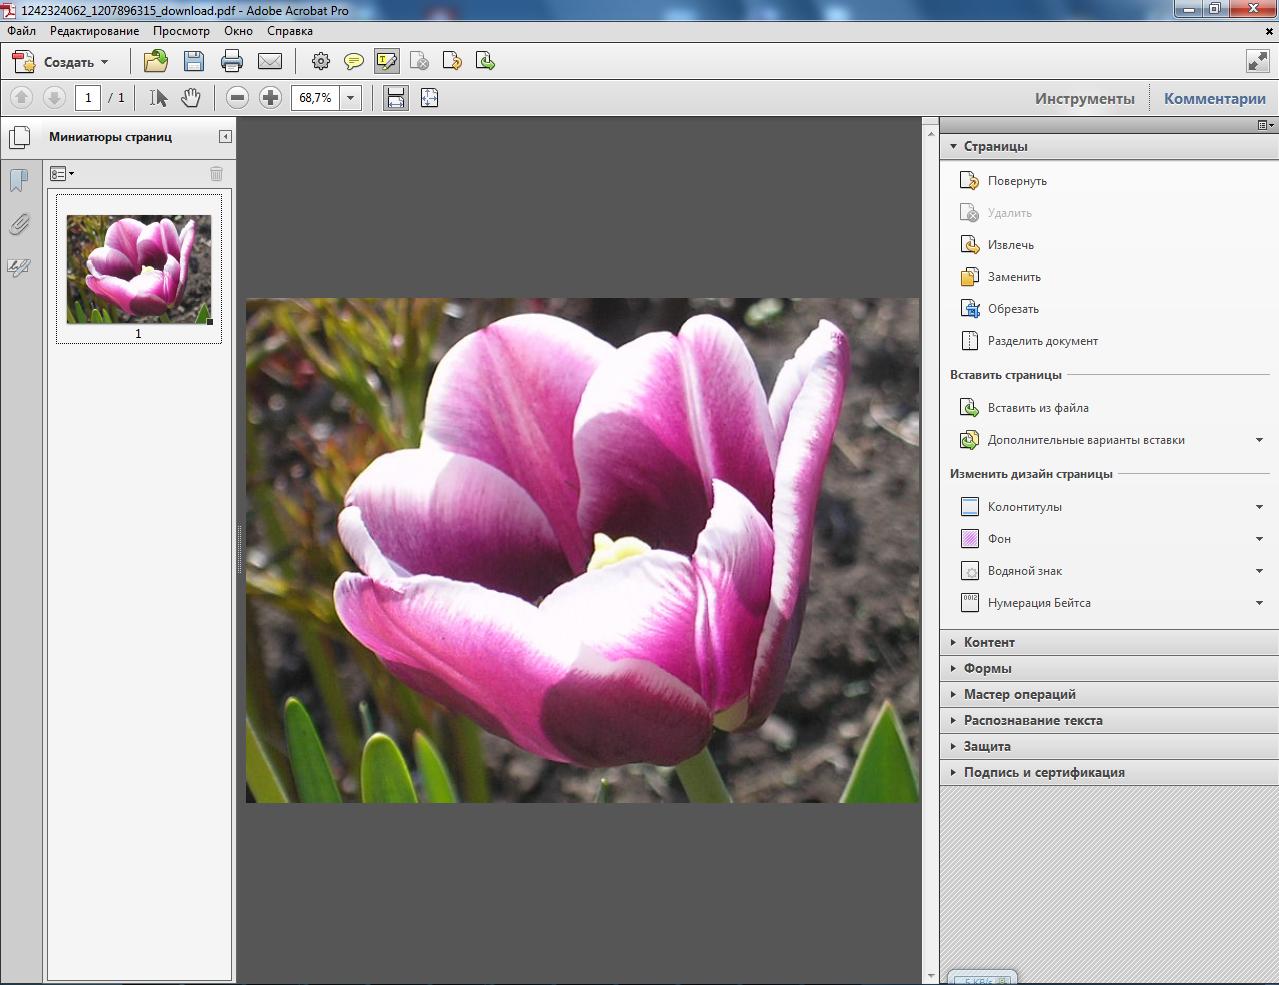 Adobe Acrobat X Professional 10.1.4